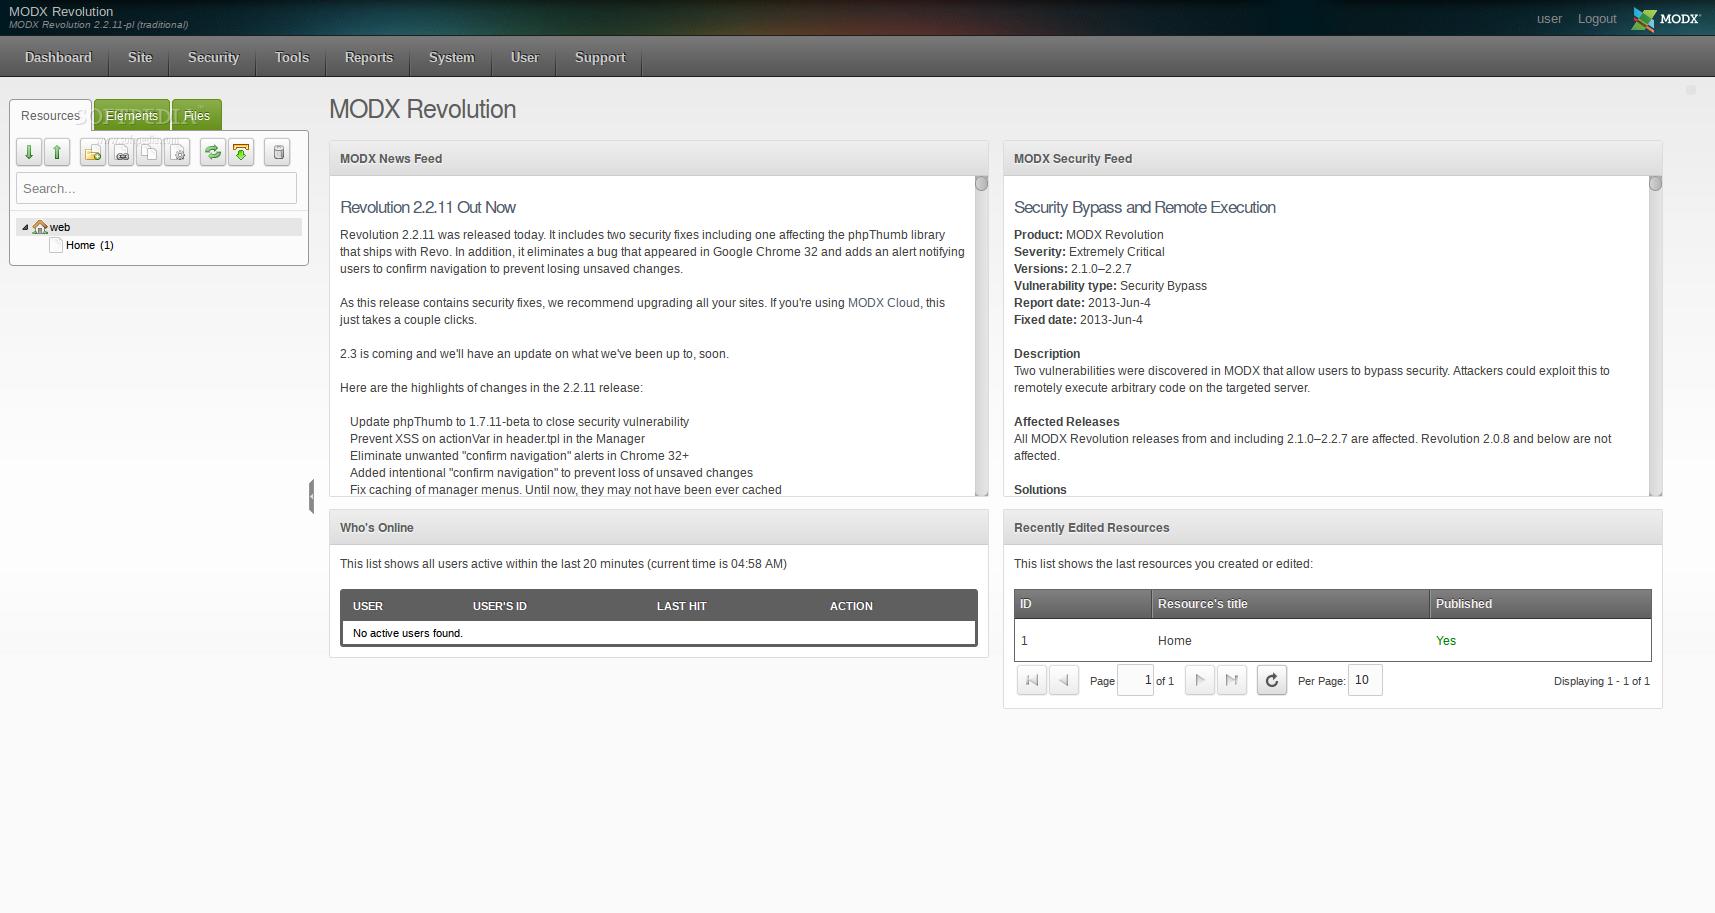 Download Bitnami MODX Module Linux 2 7 1pl-6